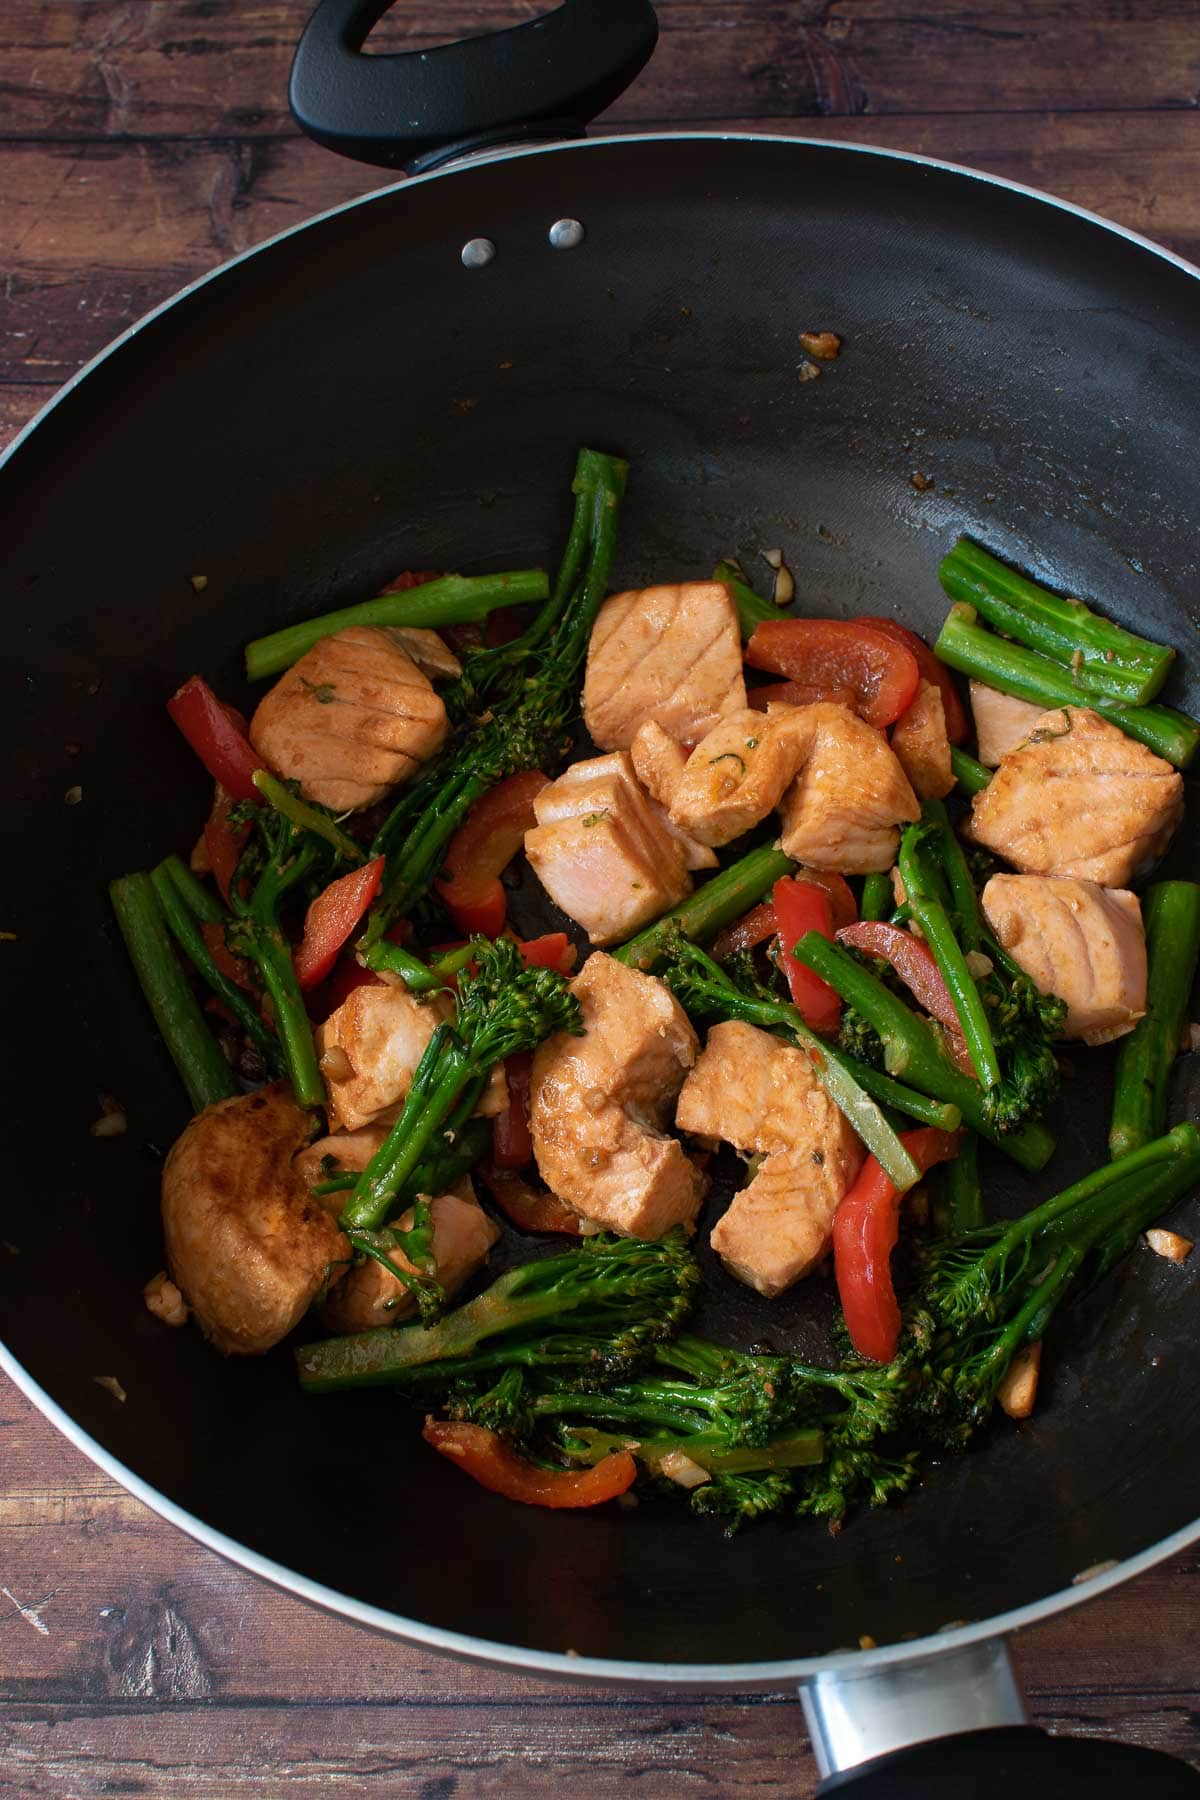 Salmon stir fry in a wok.